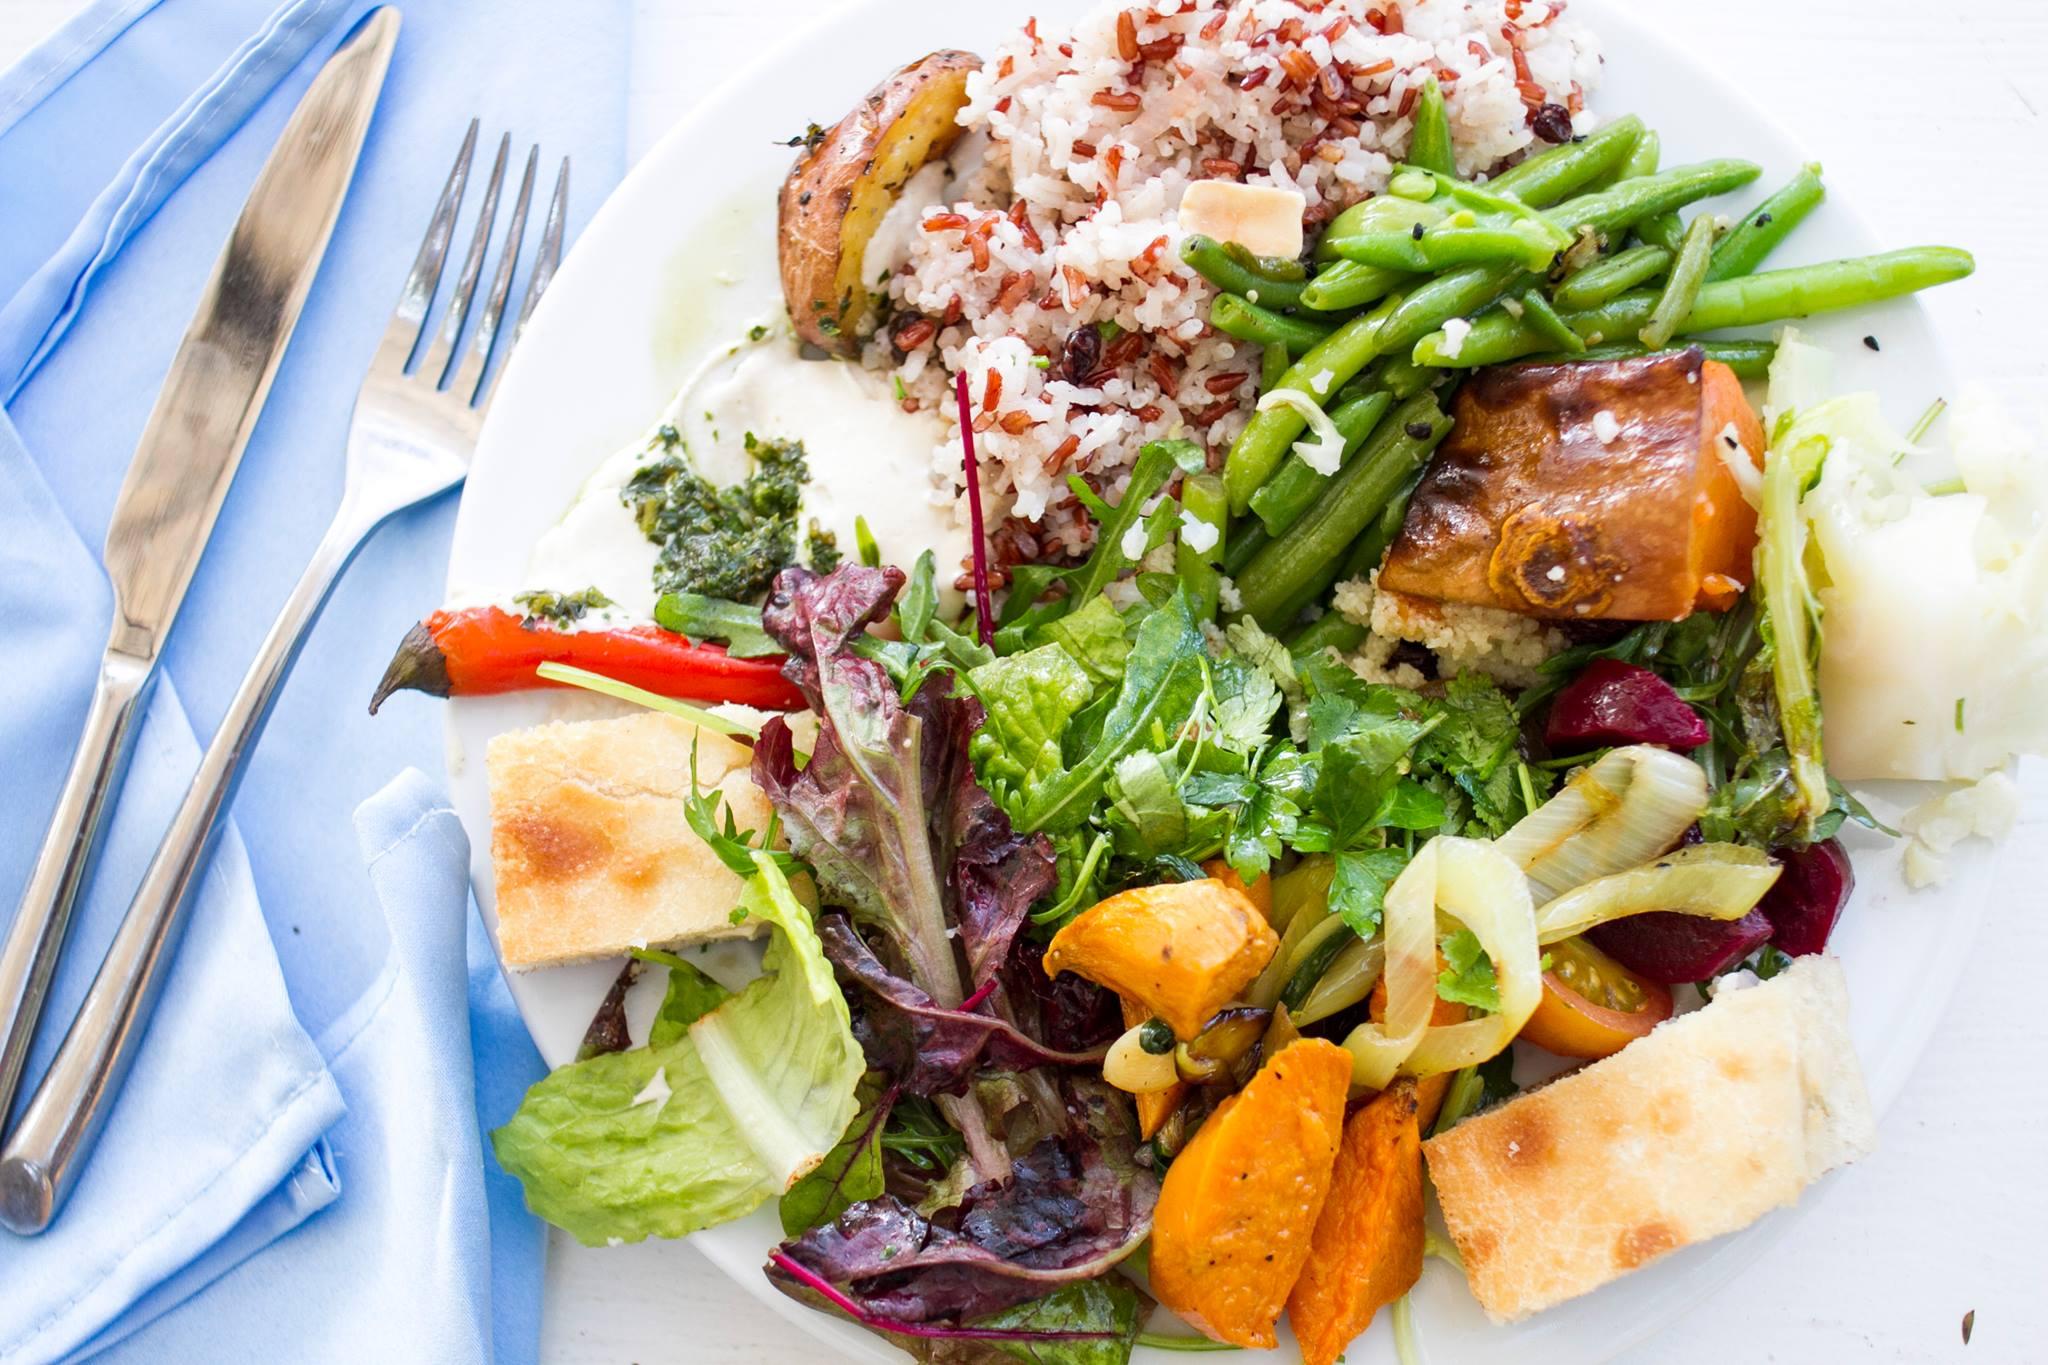 Vegan Food Recipes Buzzfeed